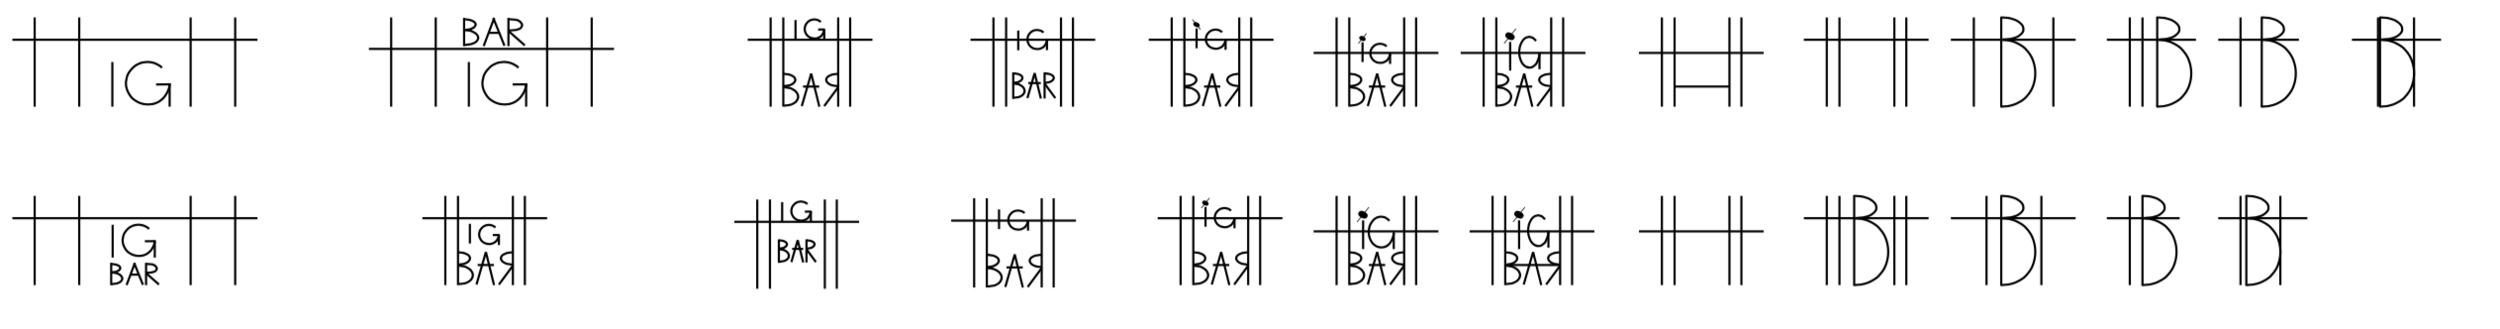 Logo development process